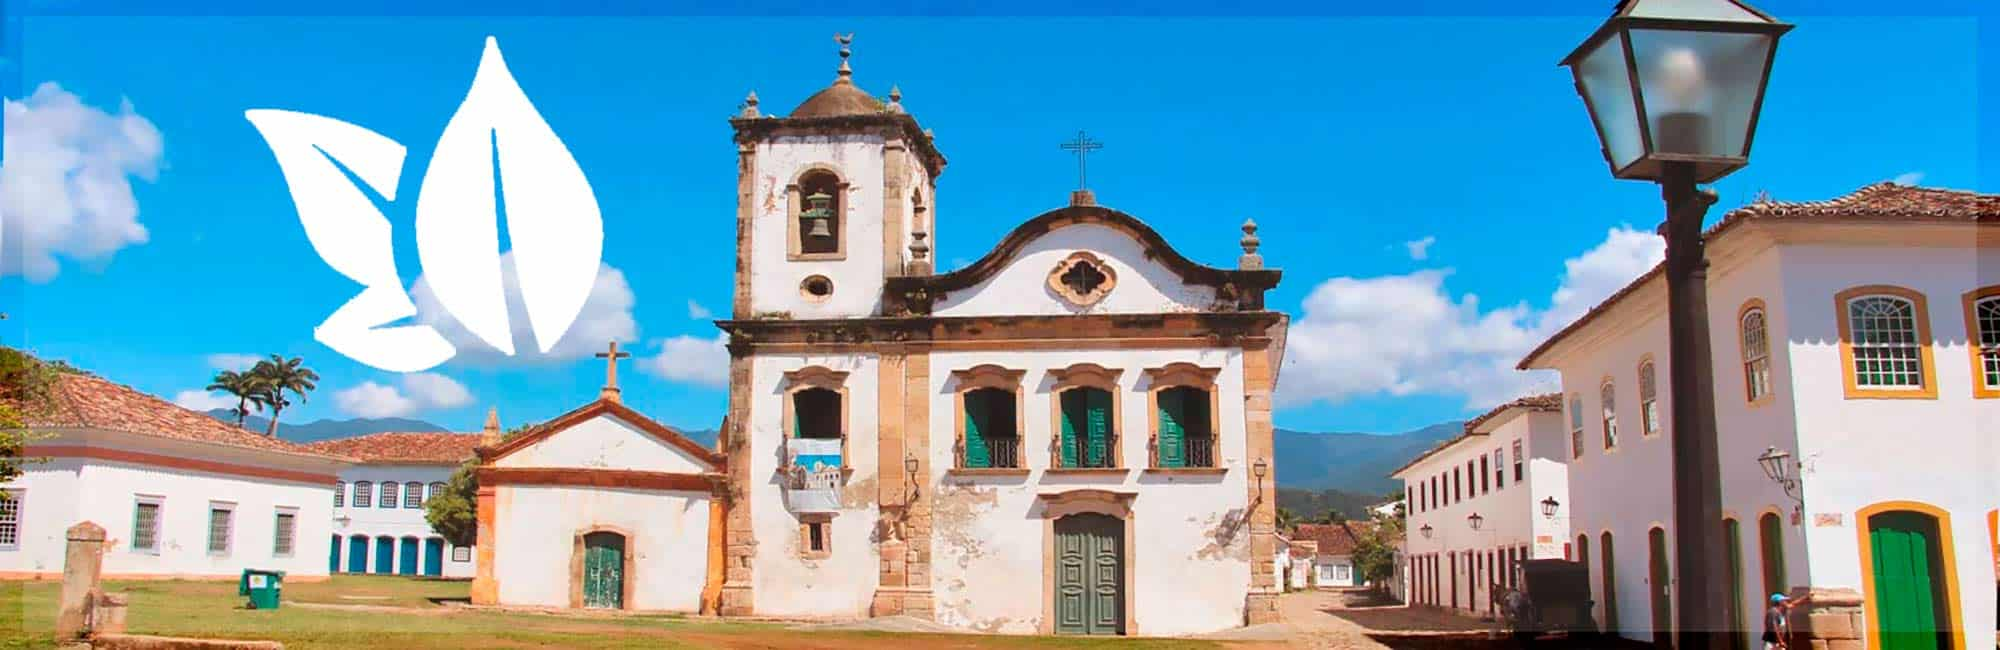 Paraty Igreja do Rosário